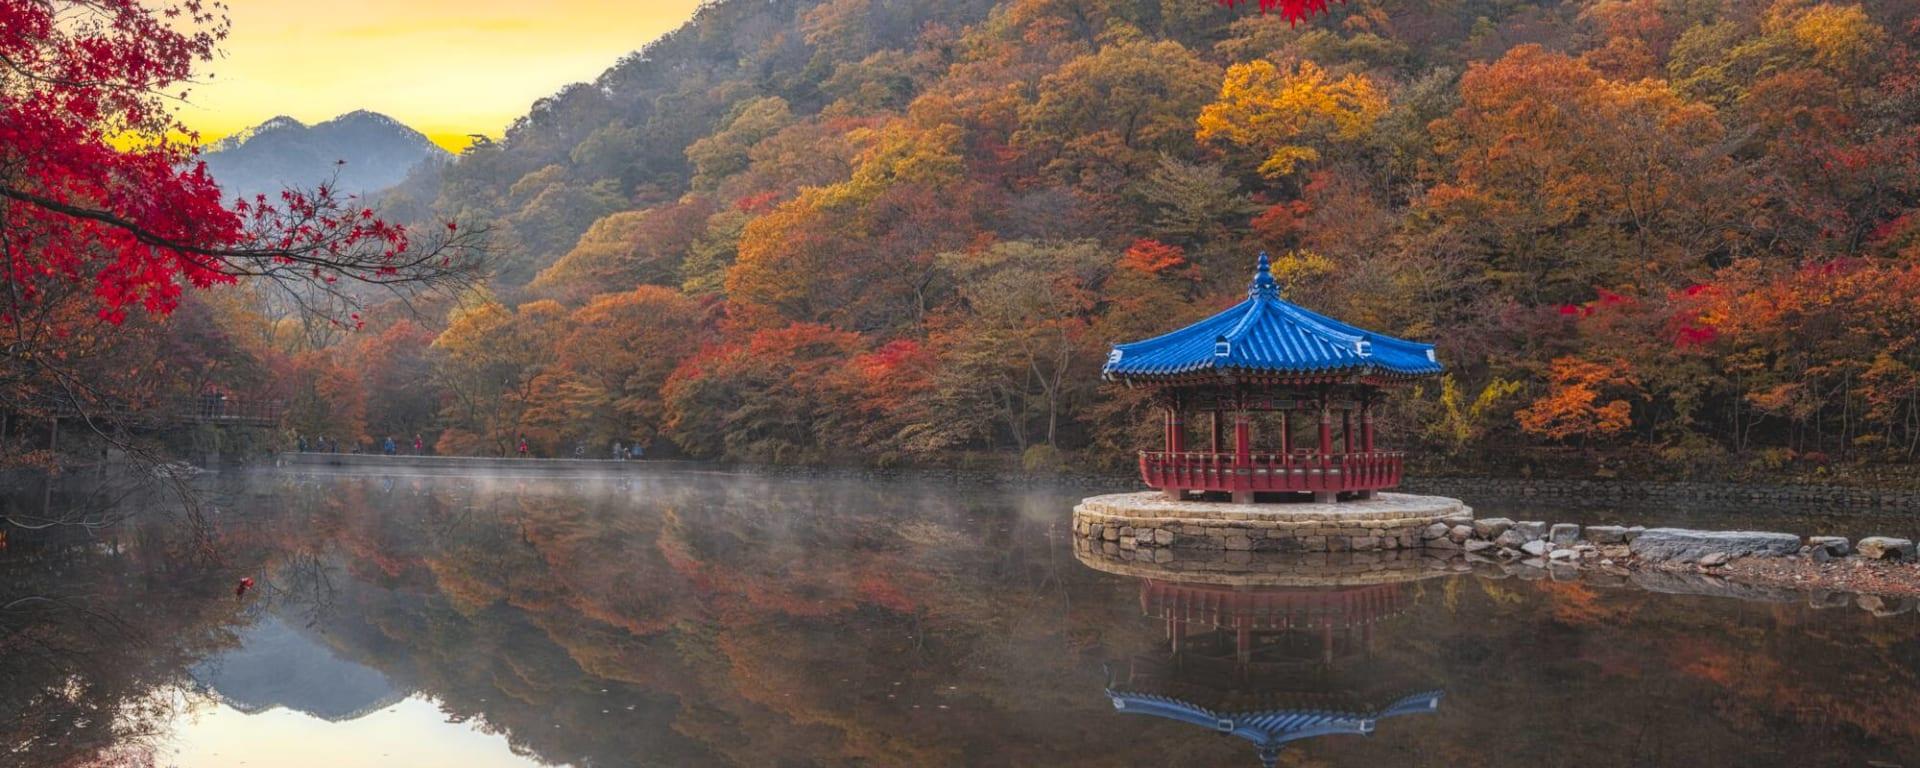 Südkorea entdecken mit Tischler Reisen: Korea Seoraksan Nationalpark